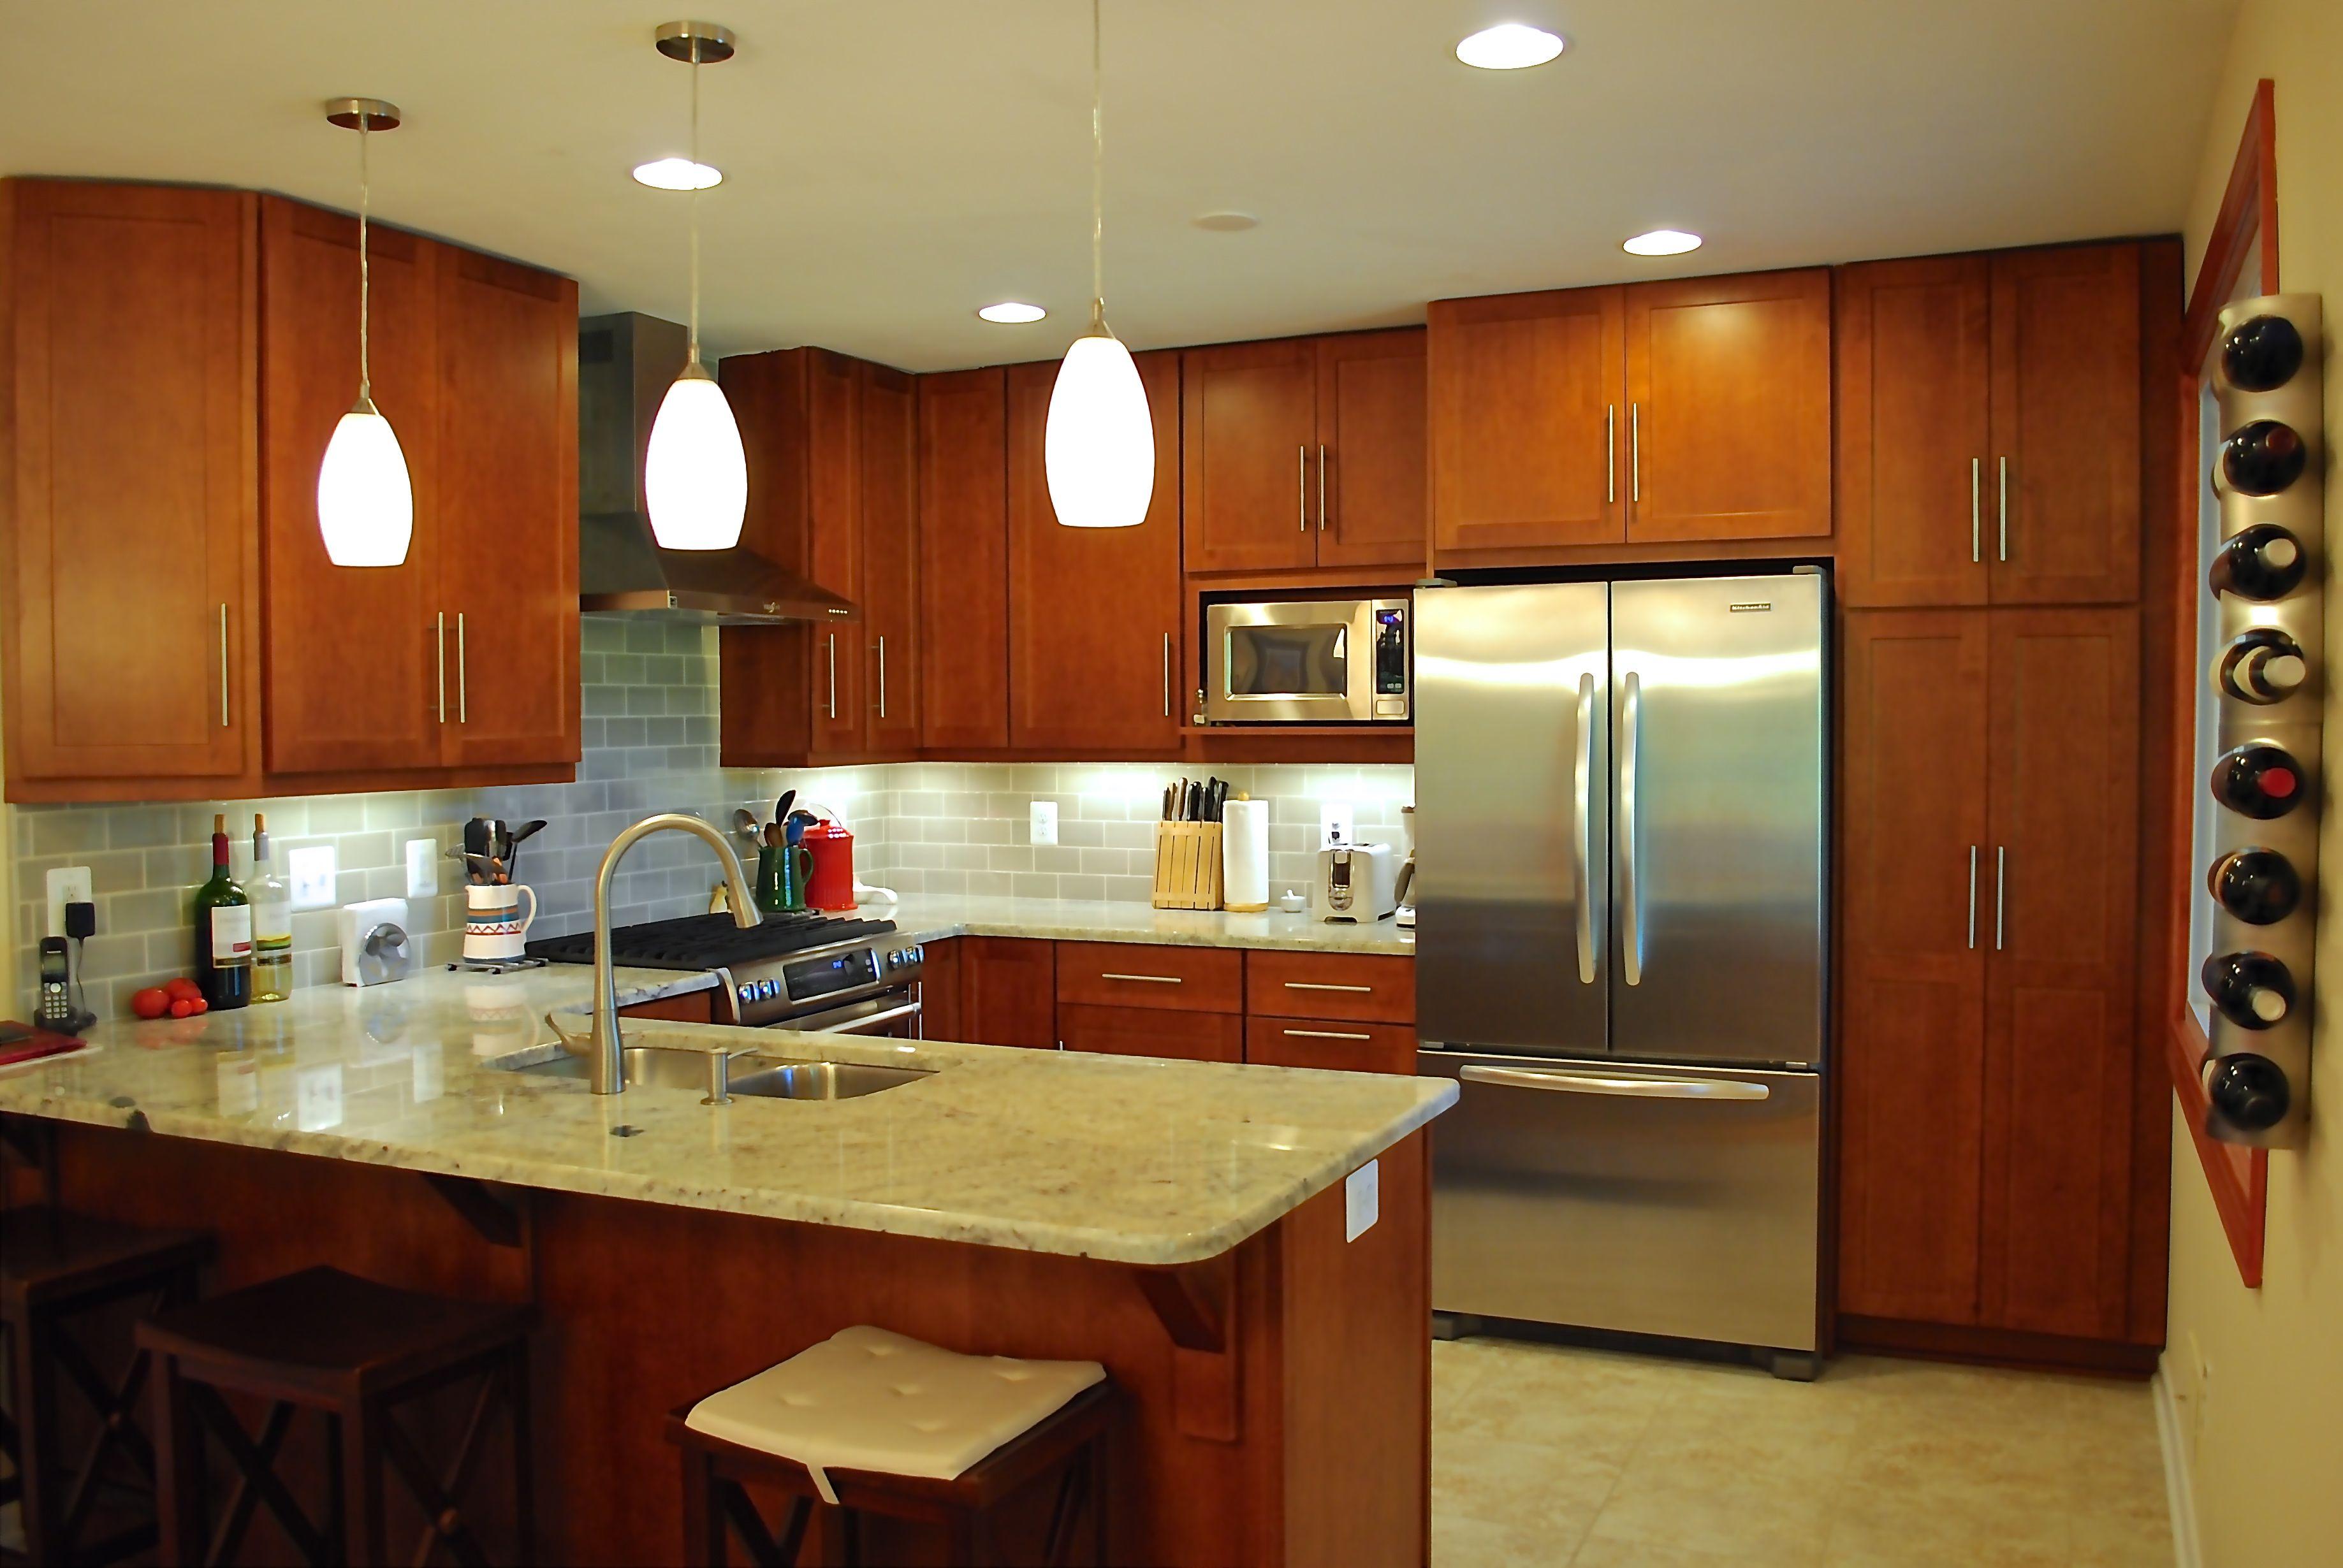 Alder Wood Stained Shaker Kitchen Cabinets By Applianceland Com Kitchen Renovation Modern Kitchen Home Kitchens